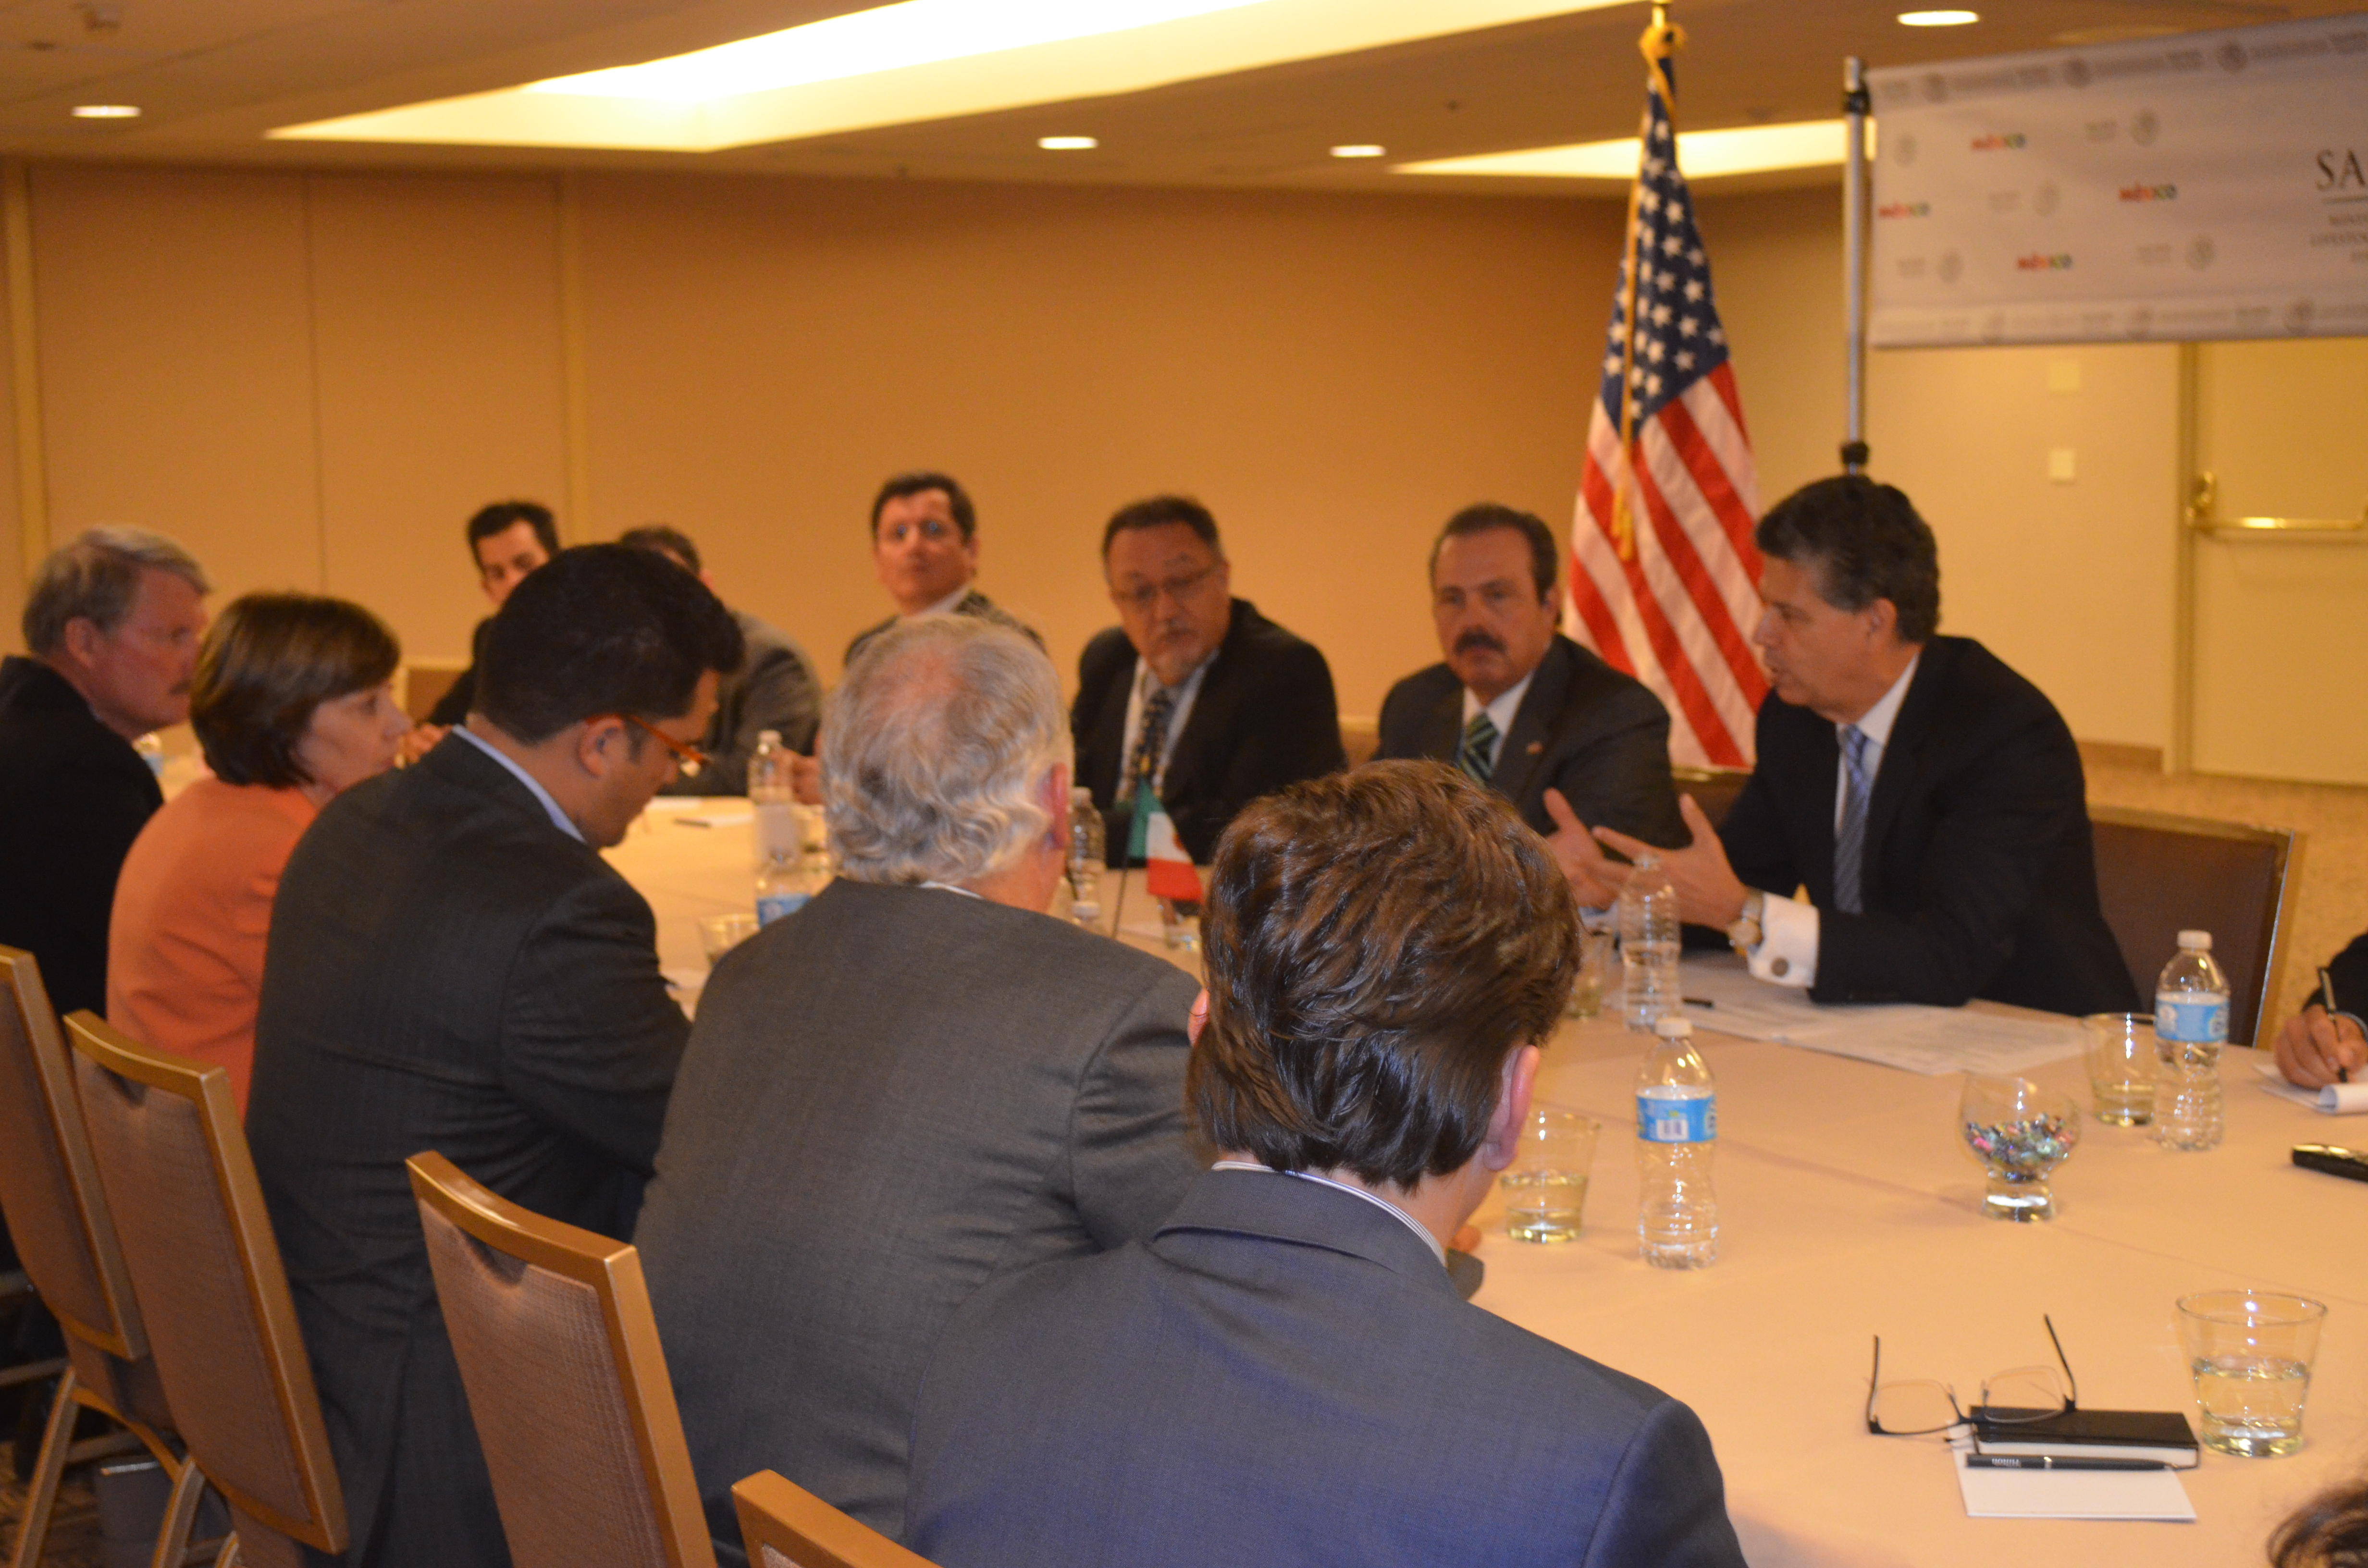 Etapa de cooperación entre México y Estados Unidos